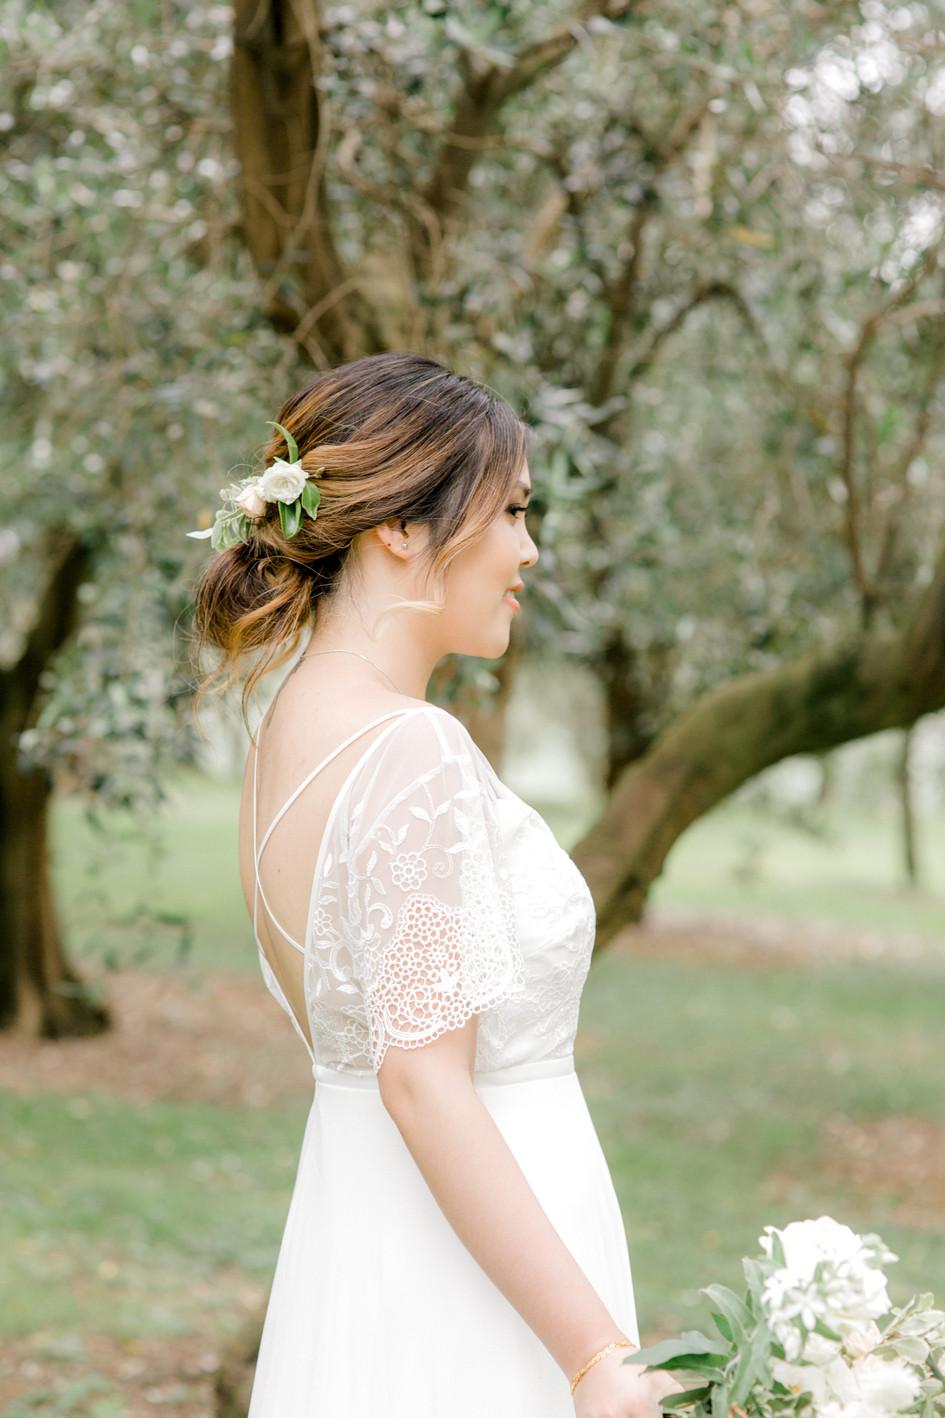 wedding_dress_details.jpg